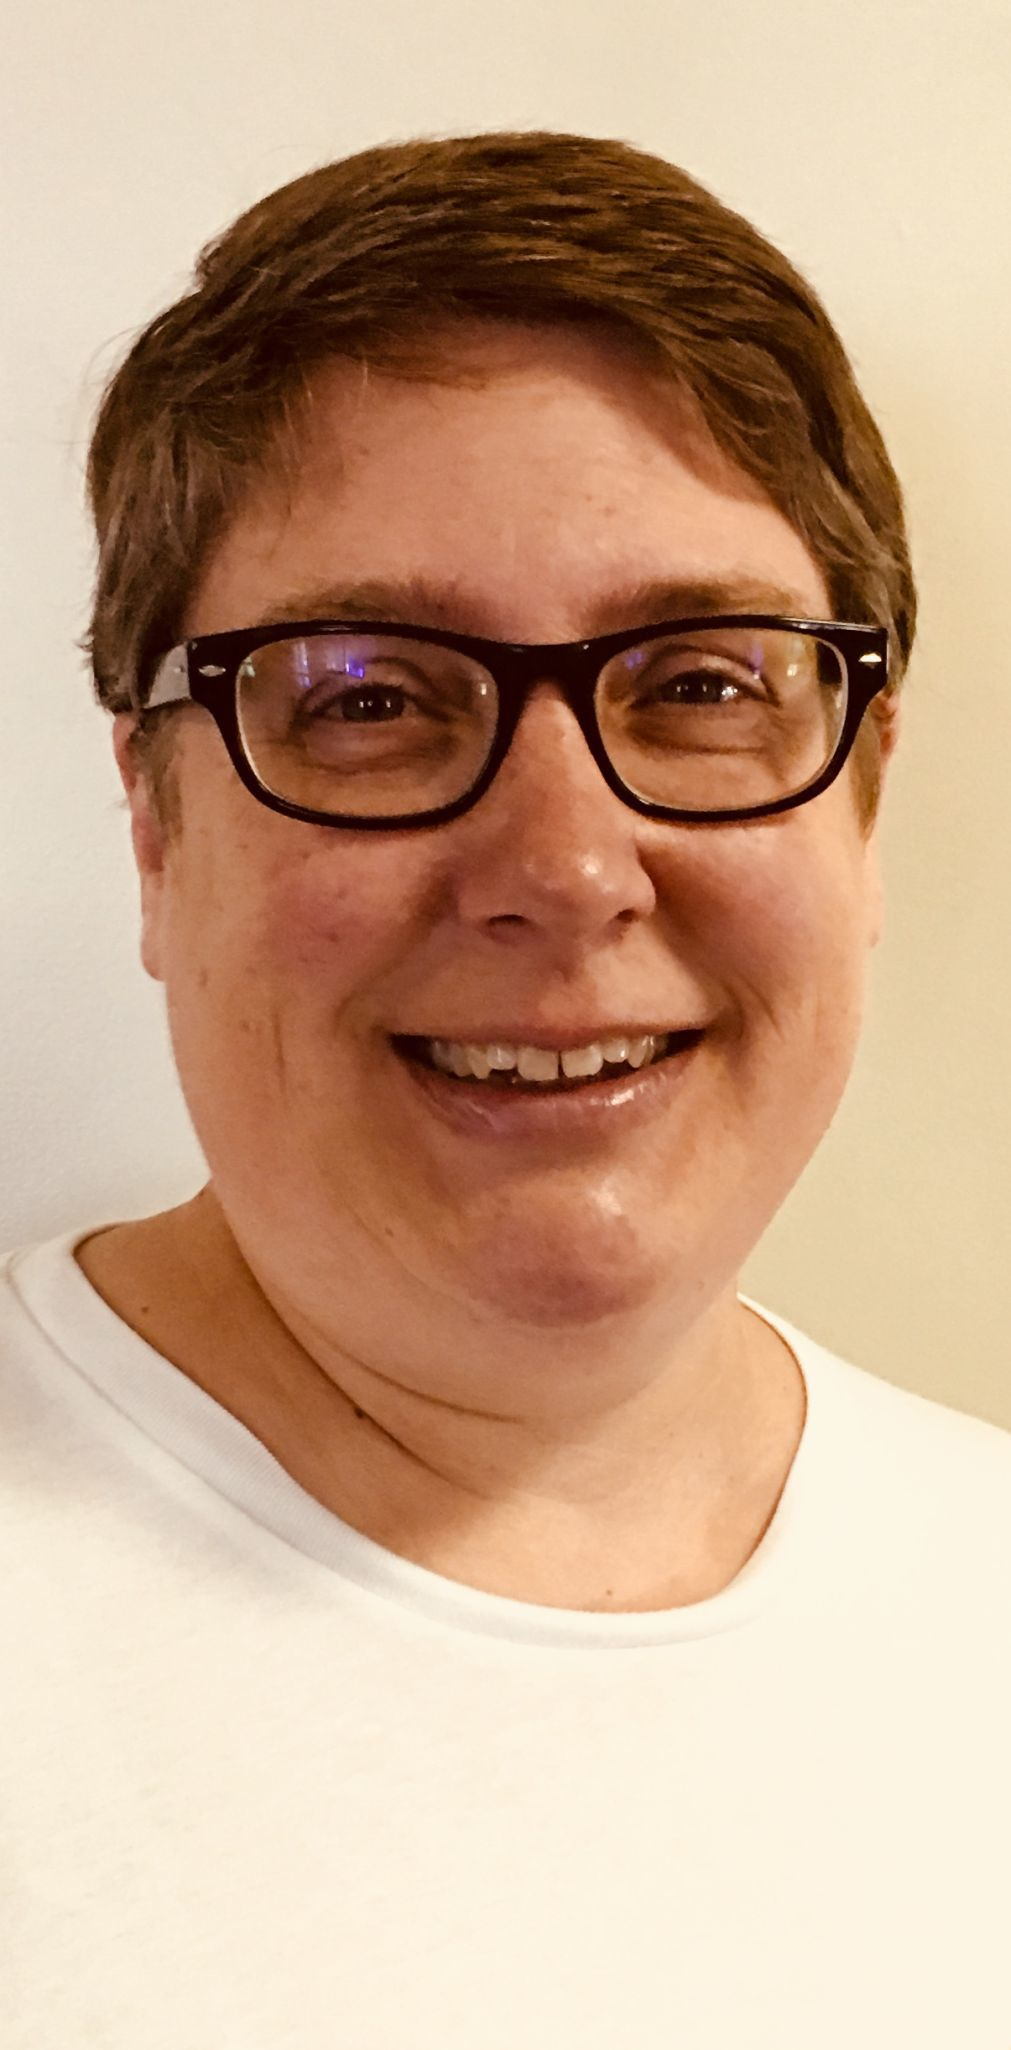 The Rev. Anna-Lisa Hunter, Bridges United pastor